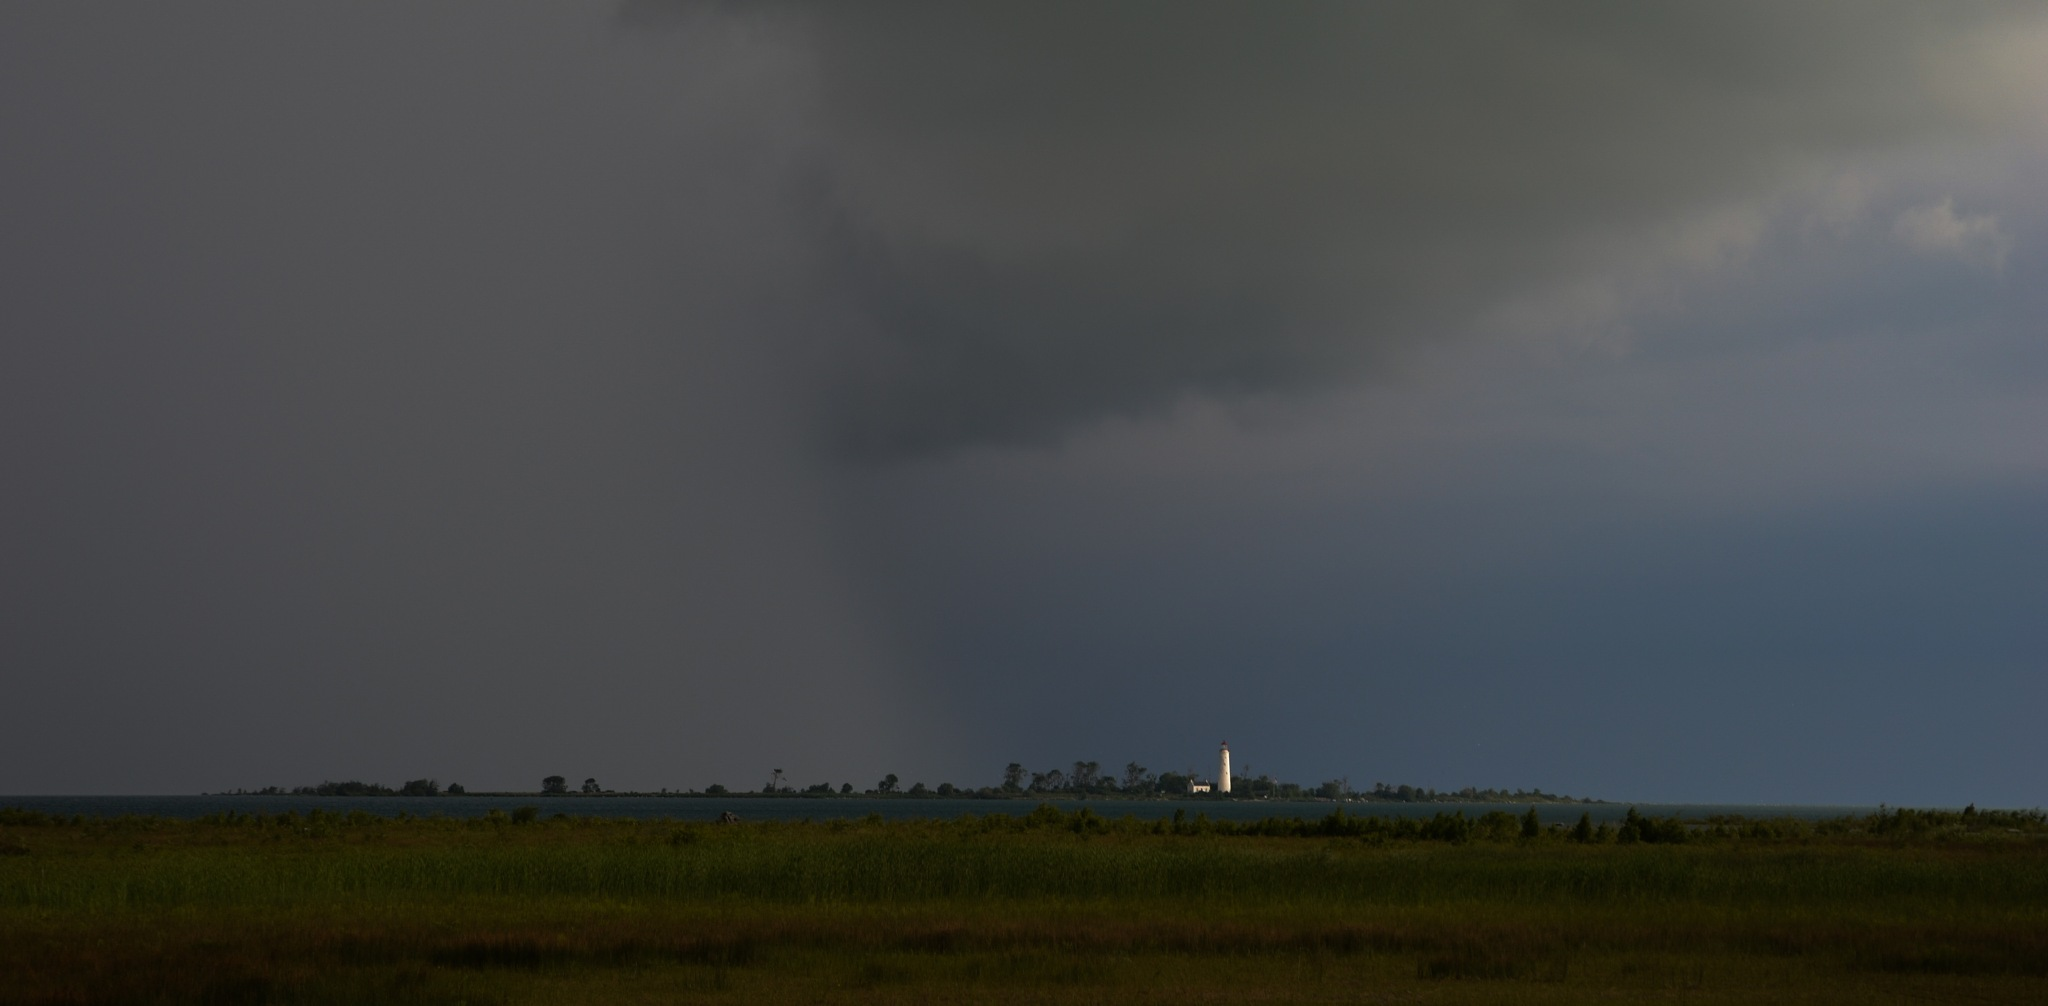 Storm Front by Steve Webb